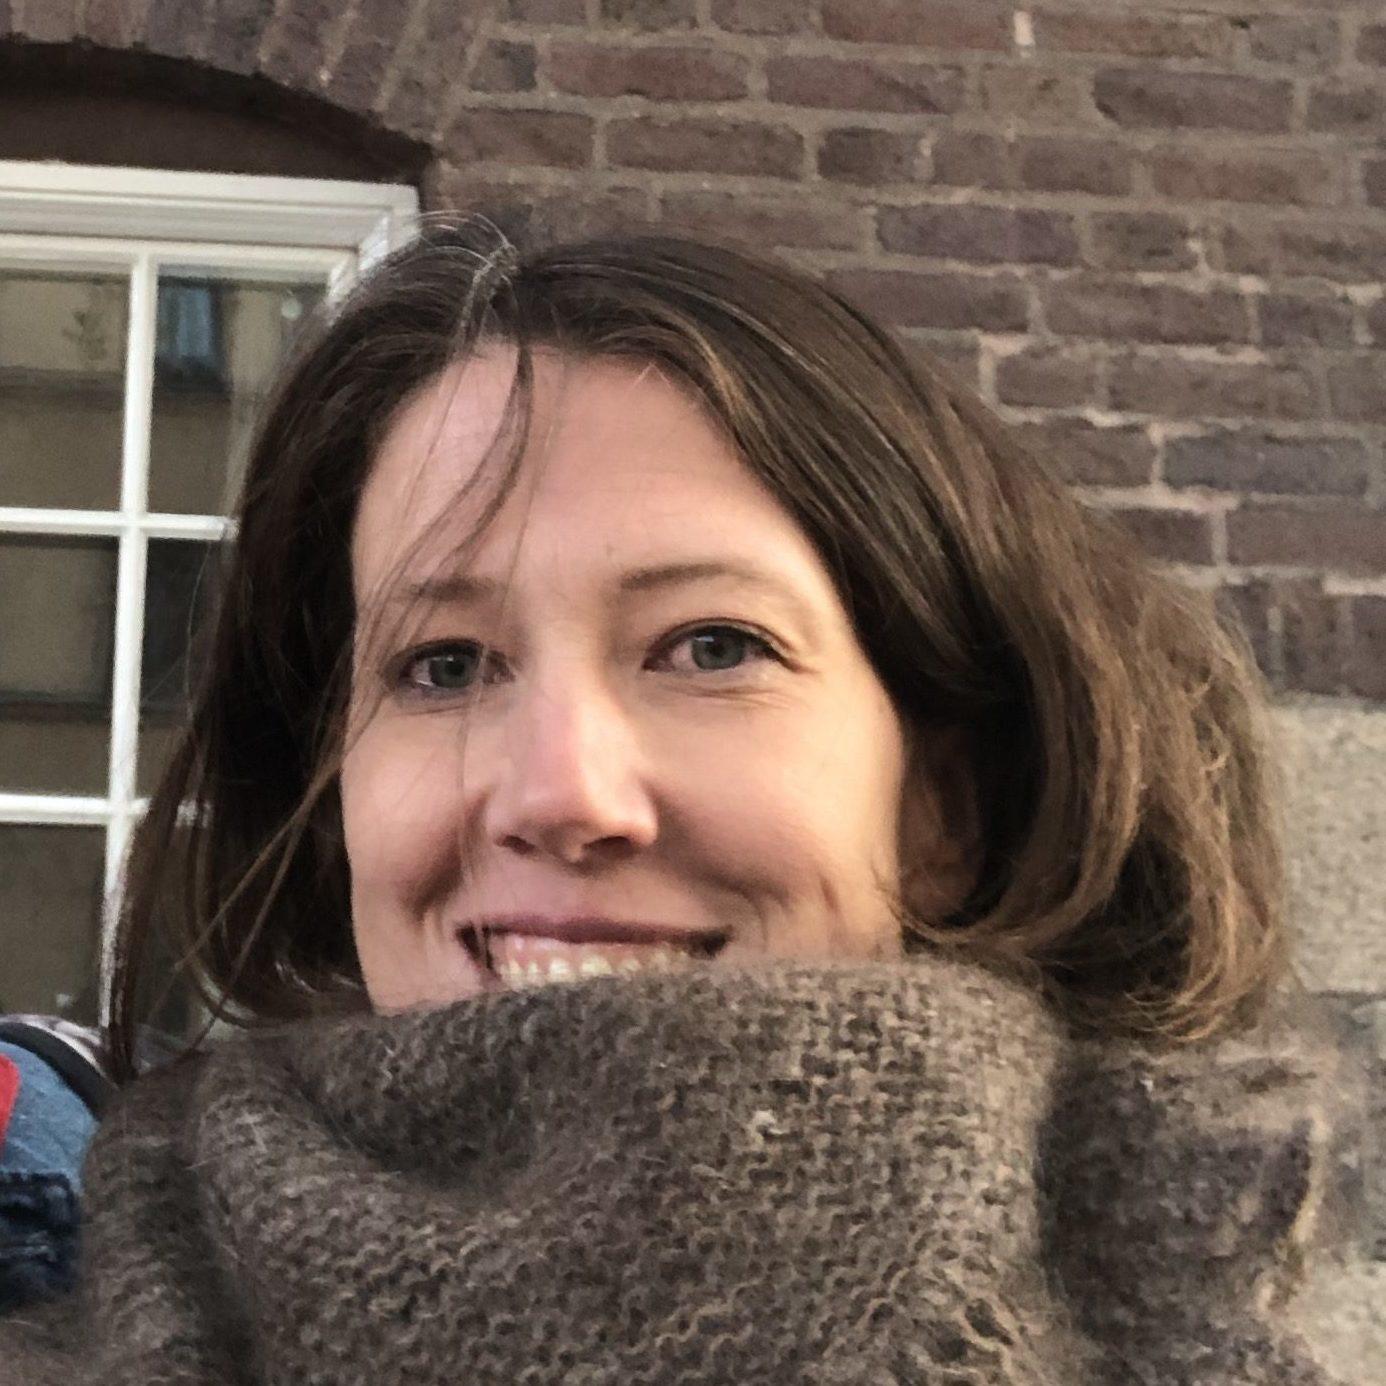 Anni Heikka